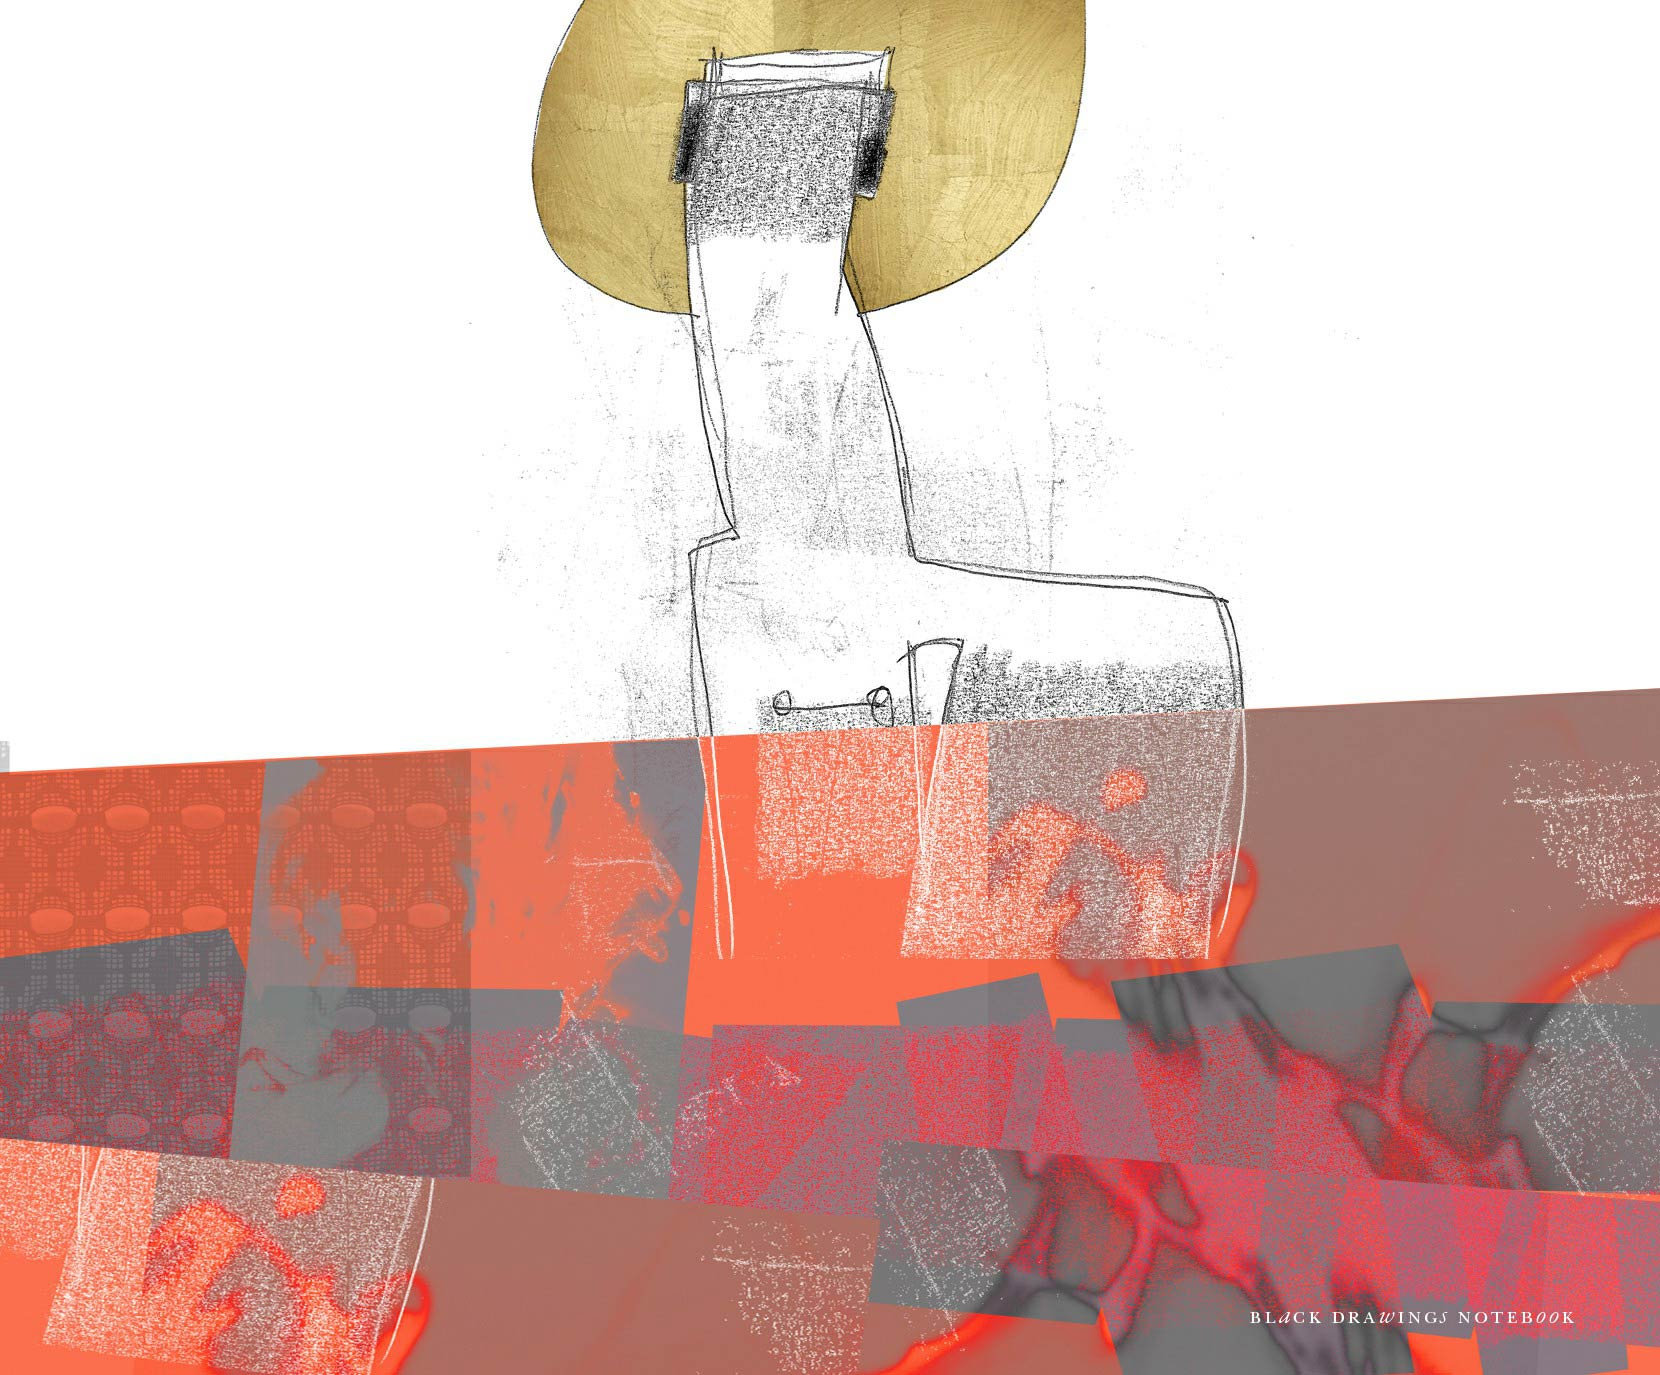 silvio-cocco-drawings-illustration-05